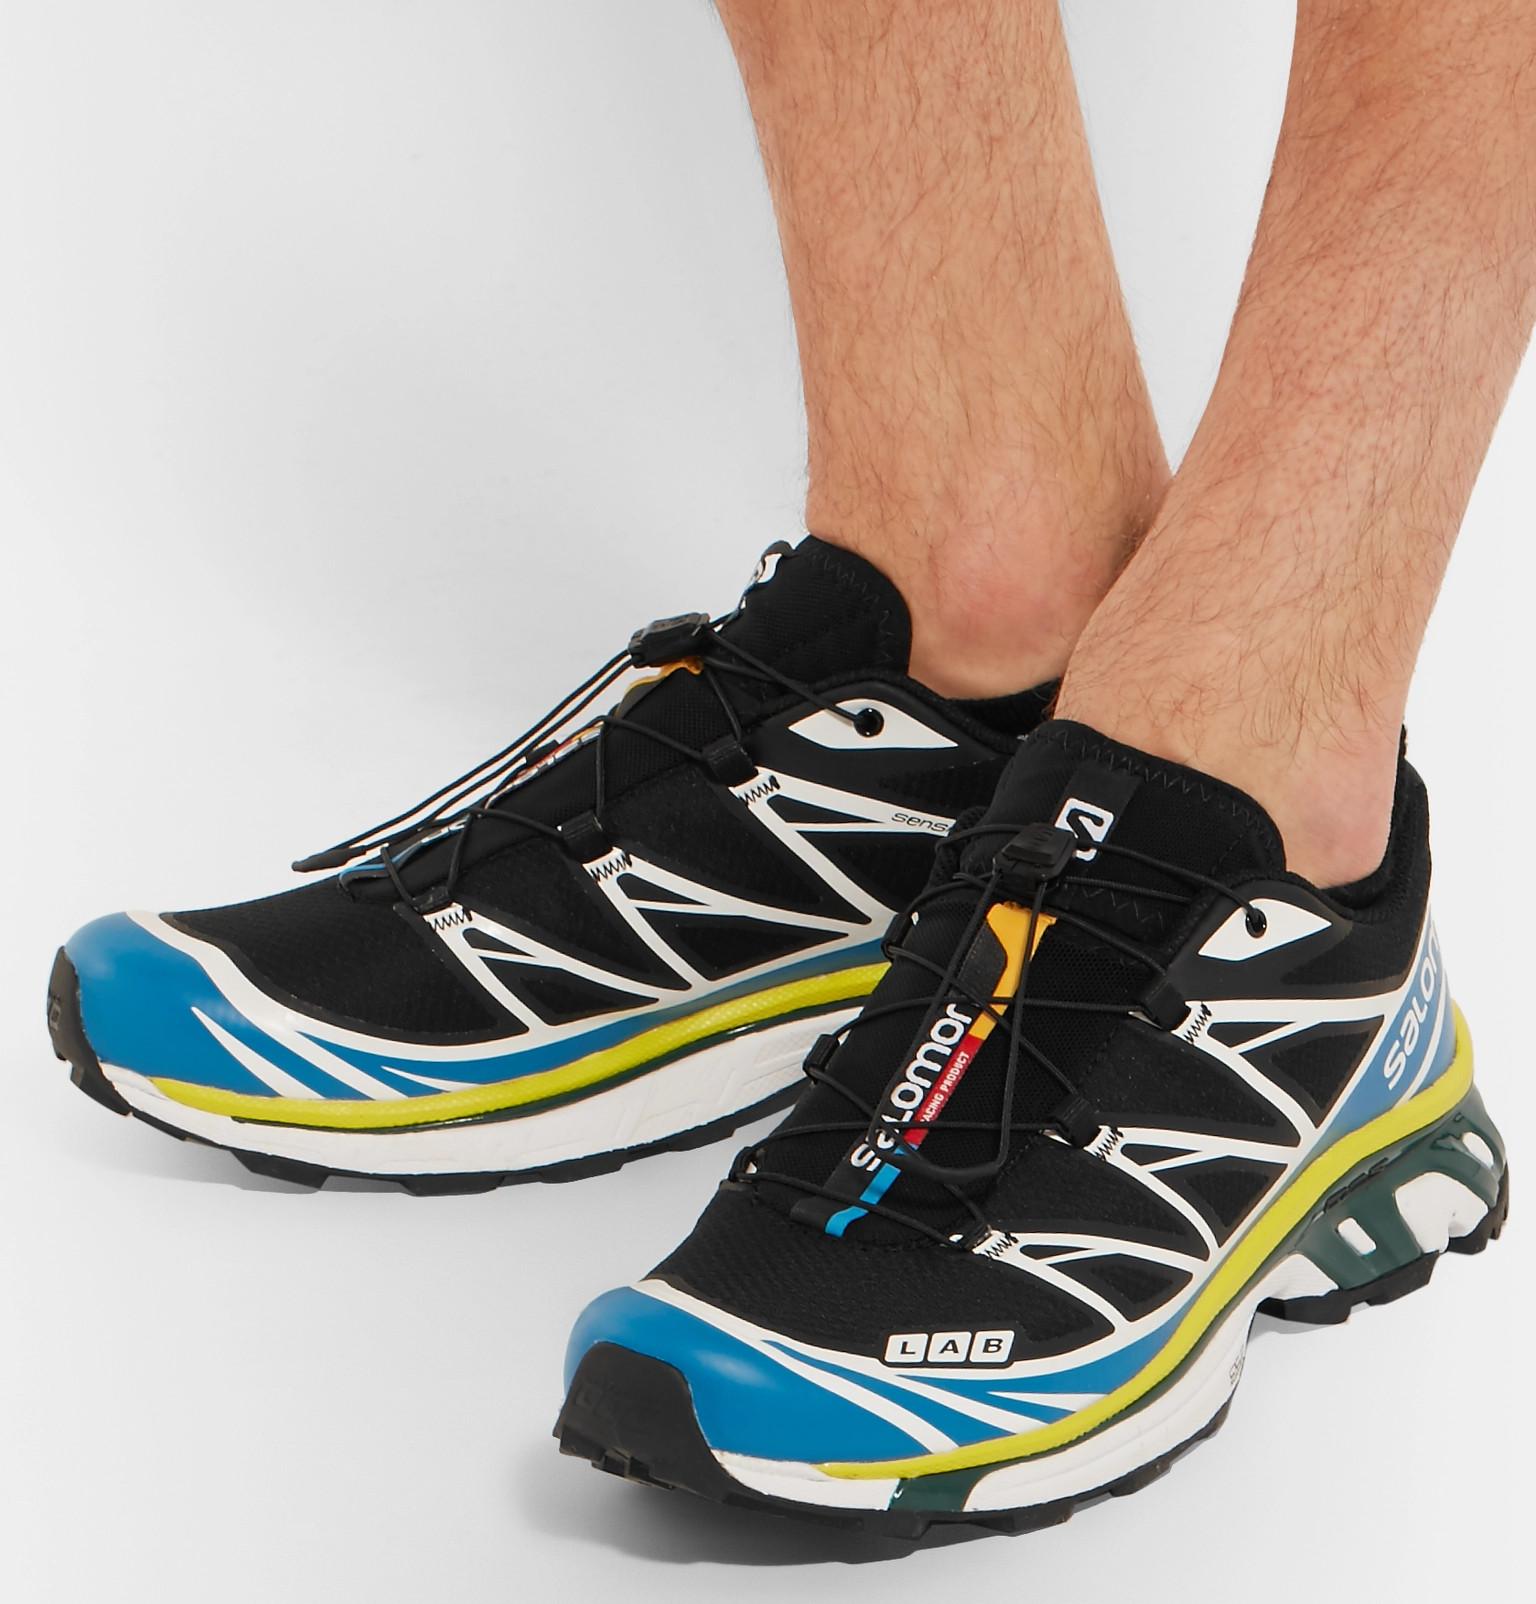 Softground Salomon Slab 6 Sneakers Xt Adv Running THwaqA16w